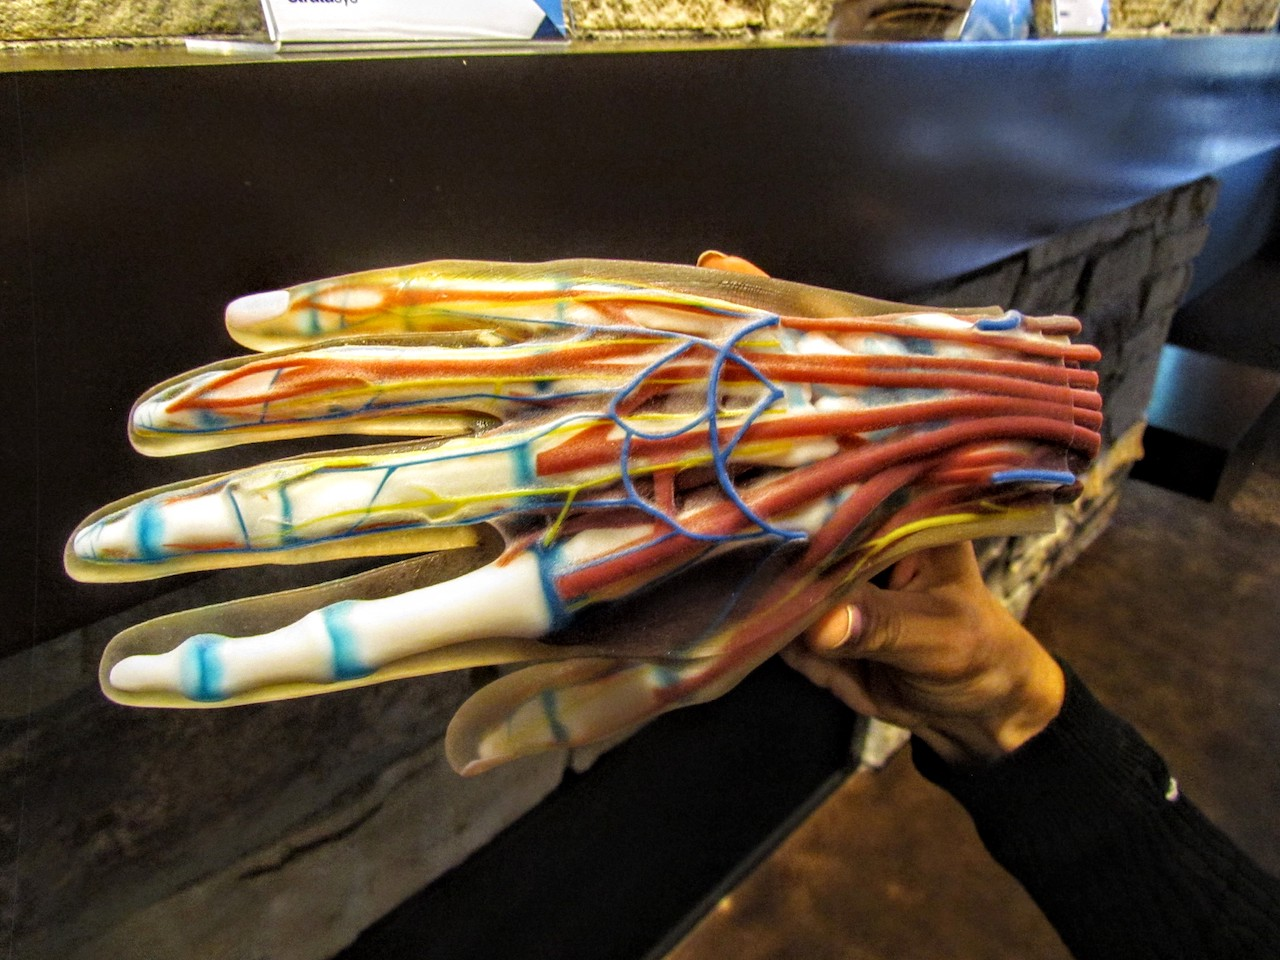 , 3D Printed Hand Replicas – A New Security Concern